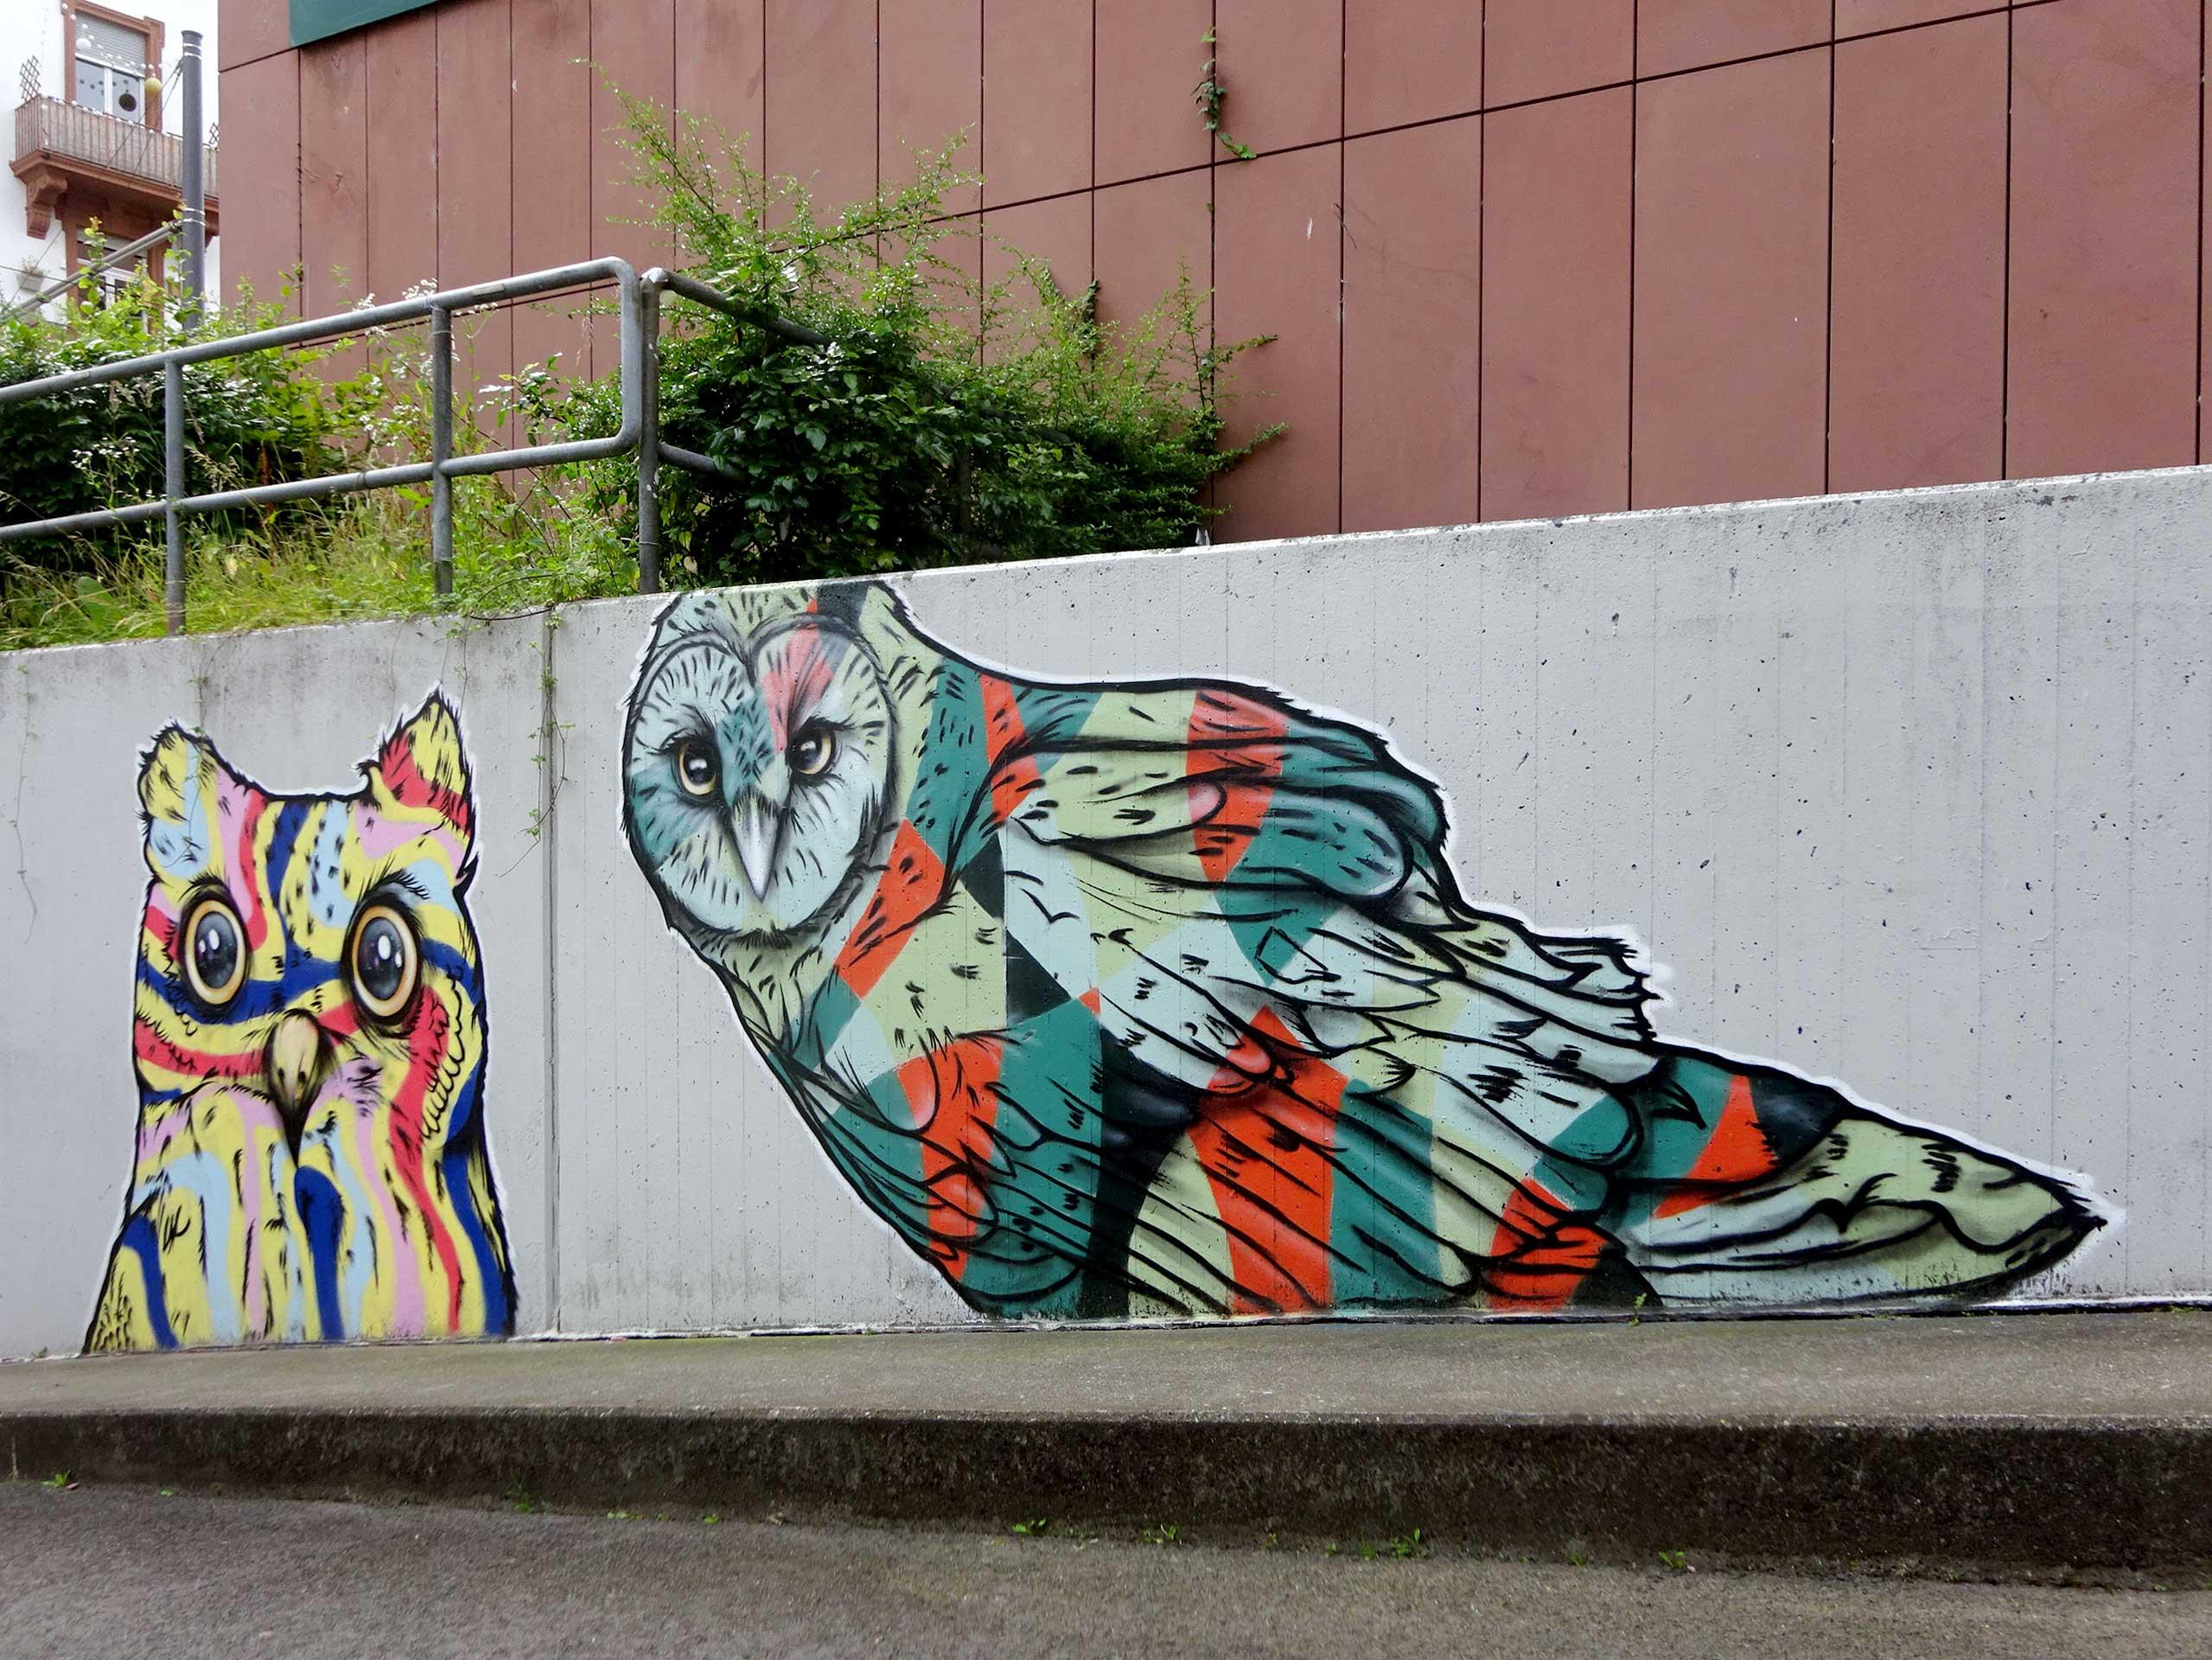 Eulen an der Musterschule in Frankfurt am Main